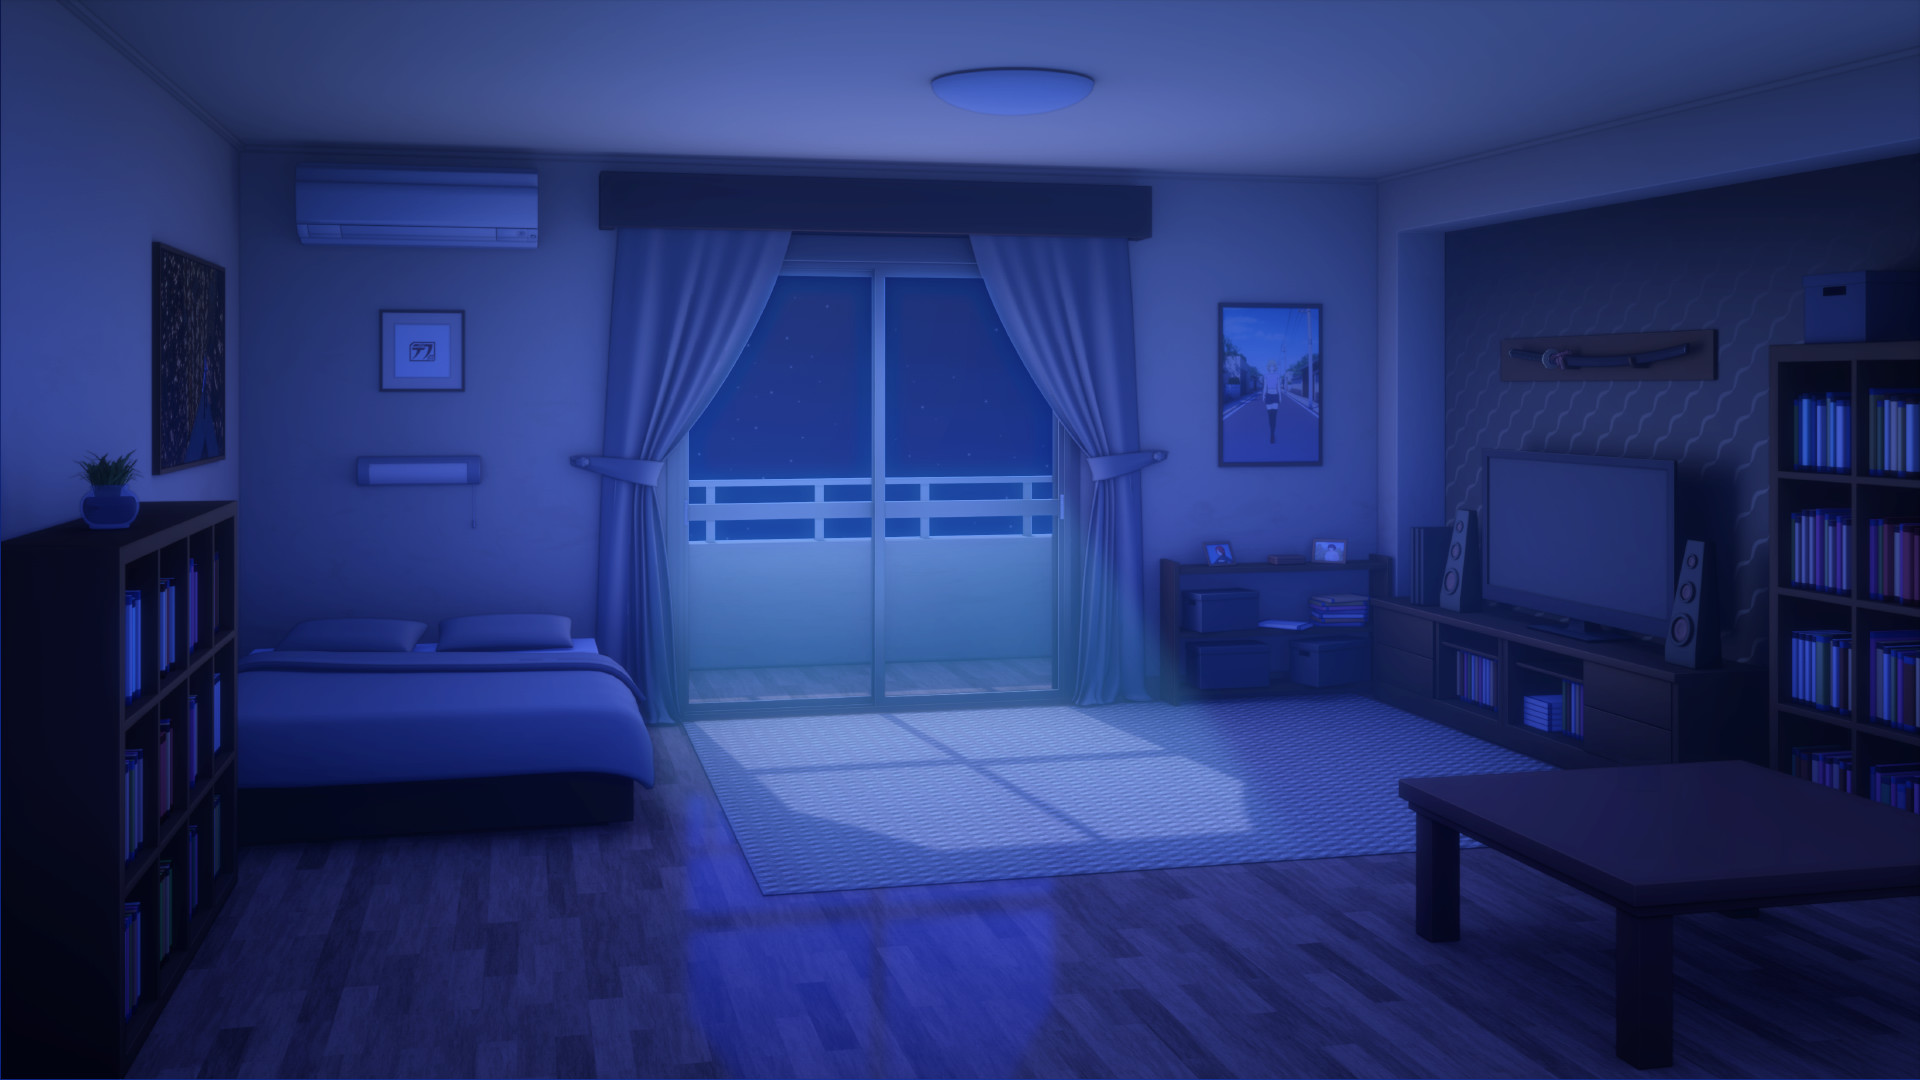 Roman stepanyuk room cc 02 night 1080p